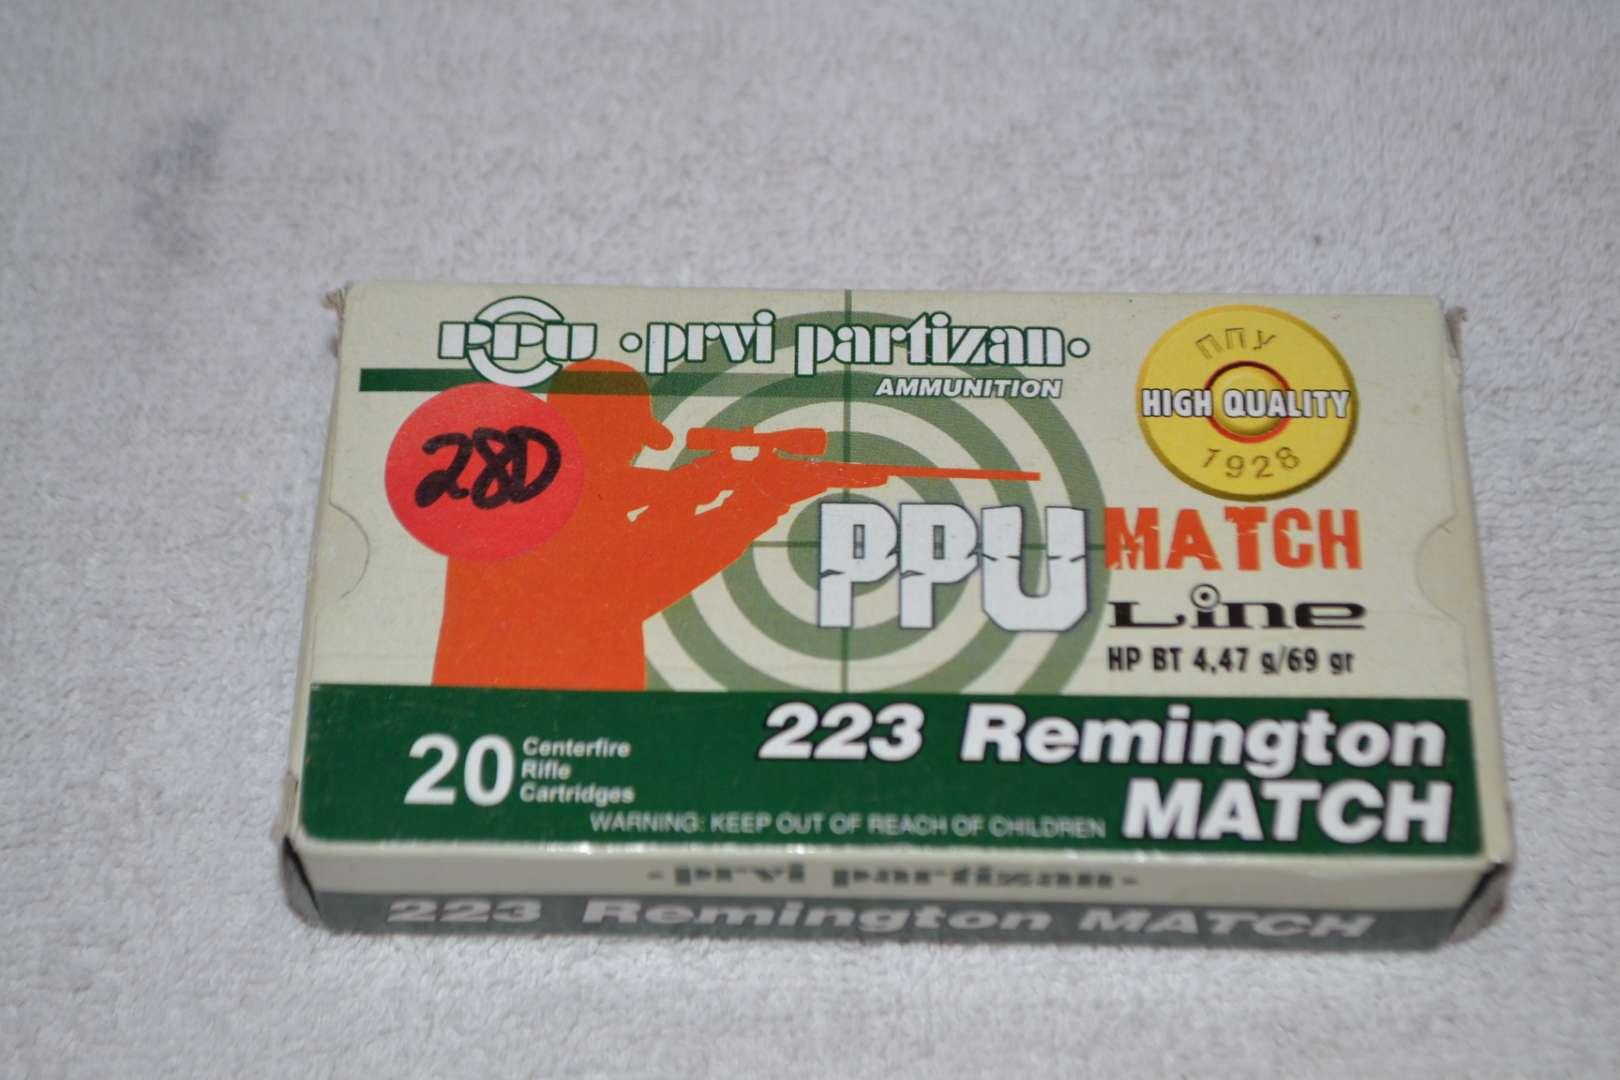 Lot # 280 223 REMINGTON MATCH 20 RIFLE CARTRIDGES